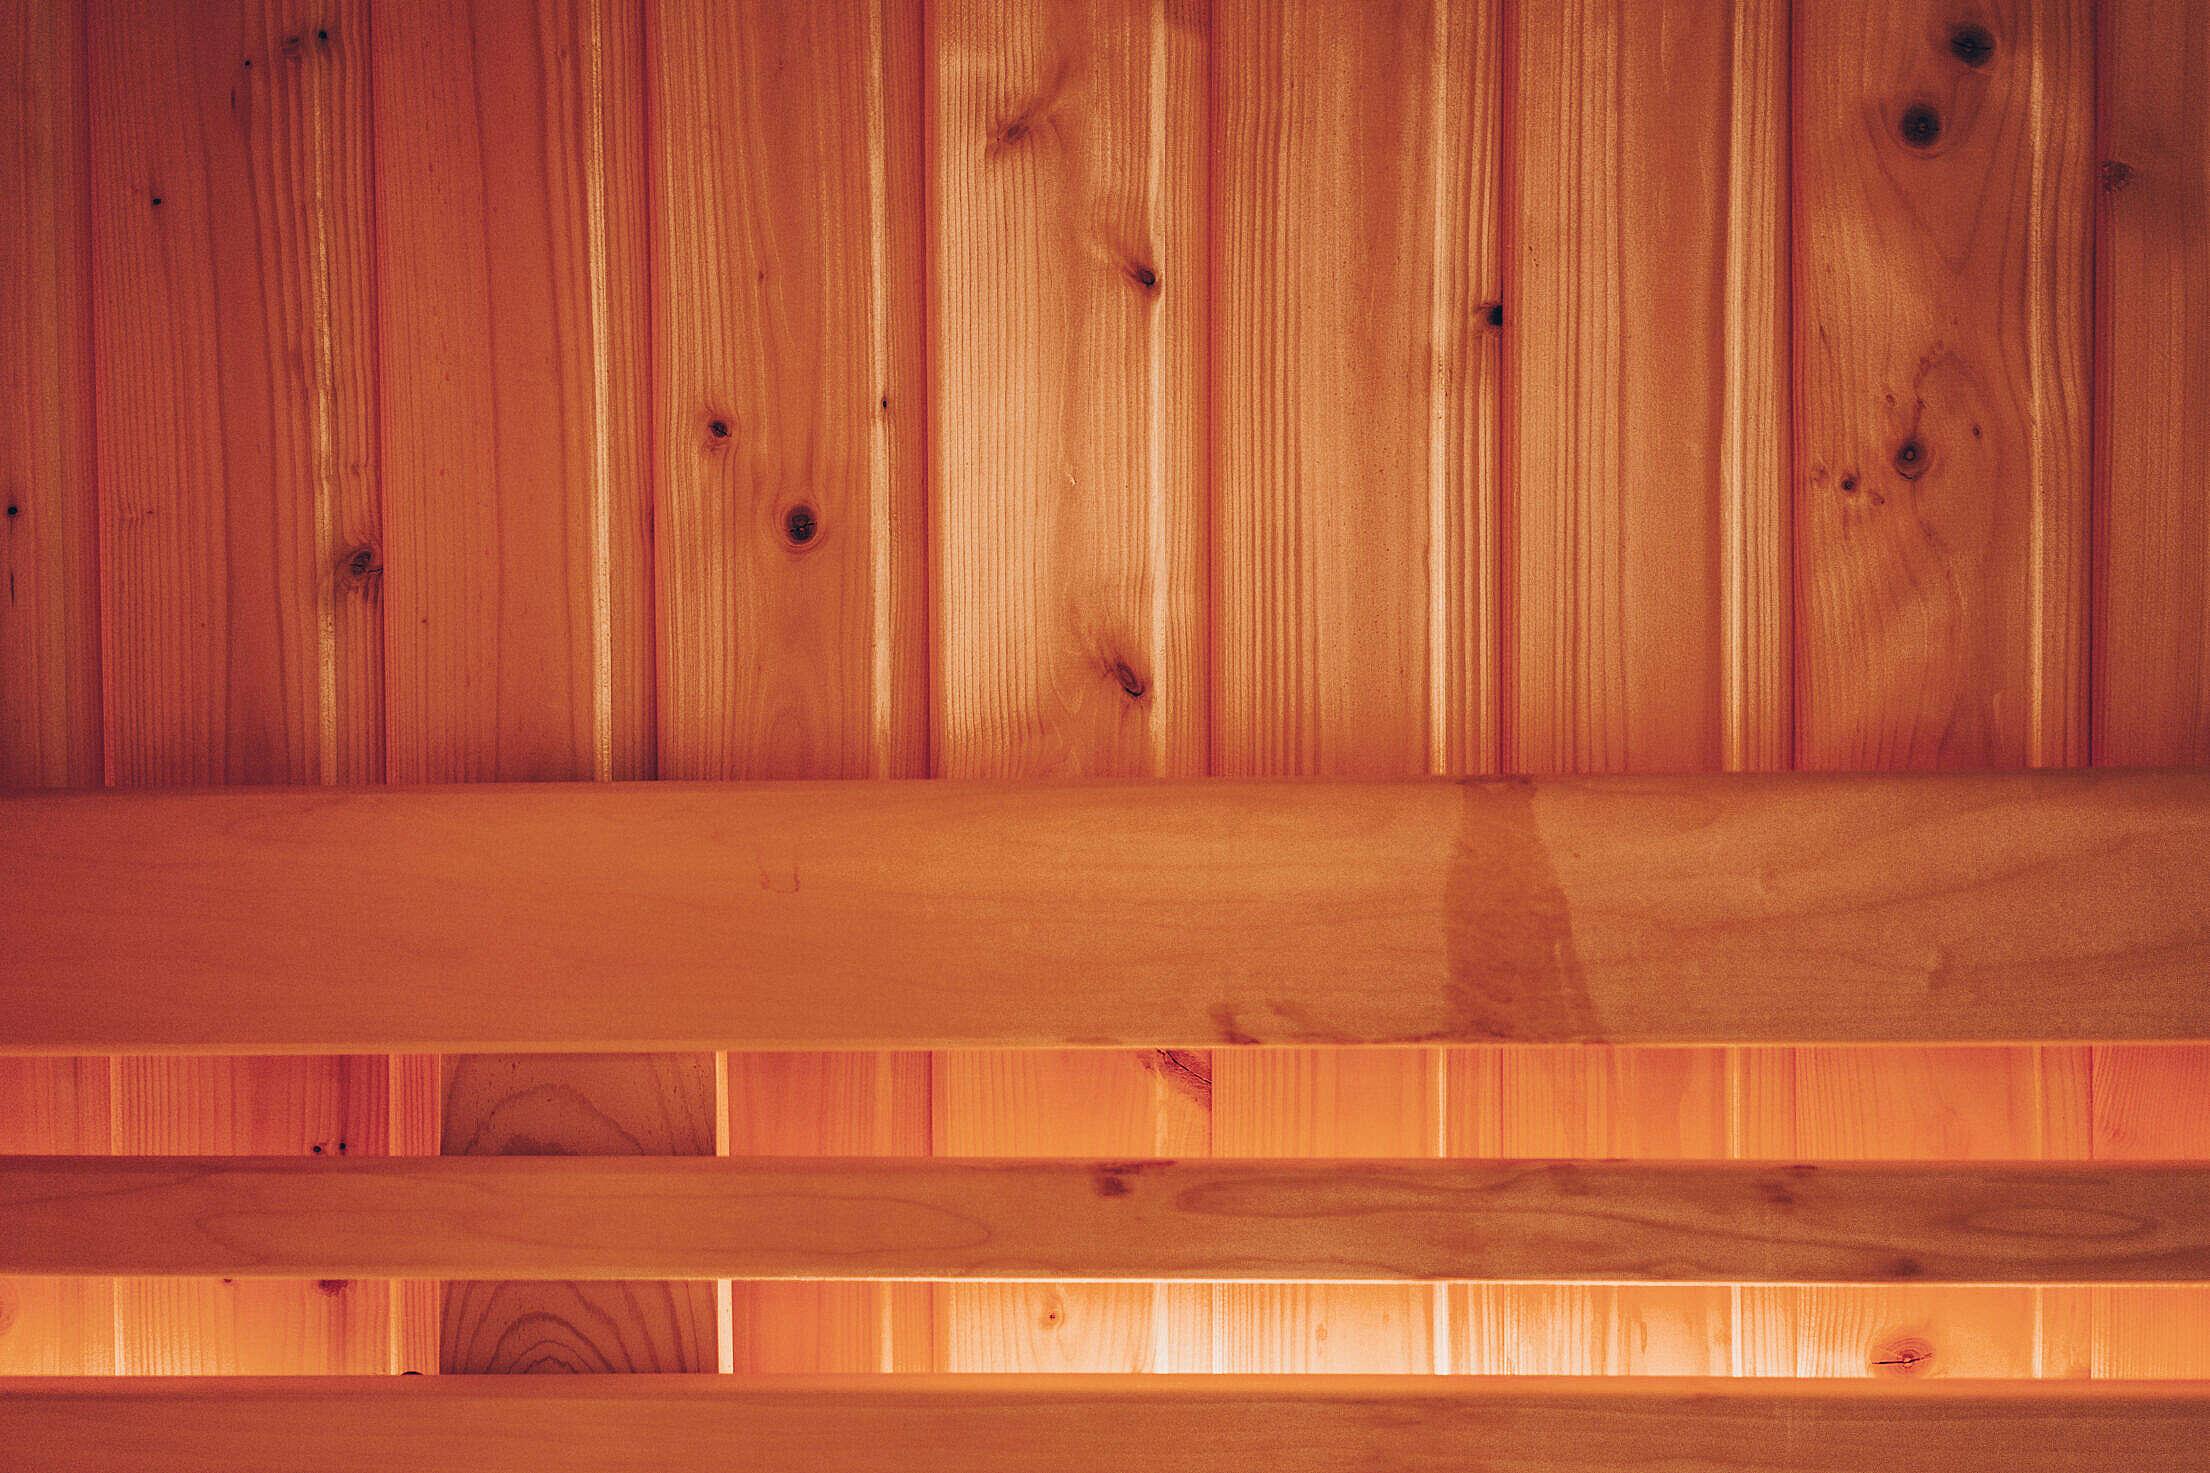 Wooden Finnish Sauna Interior Free Stock Photo